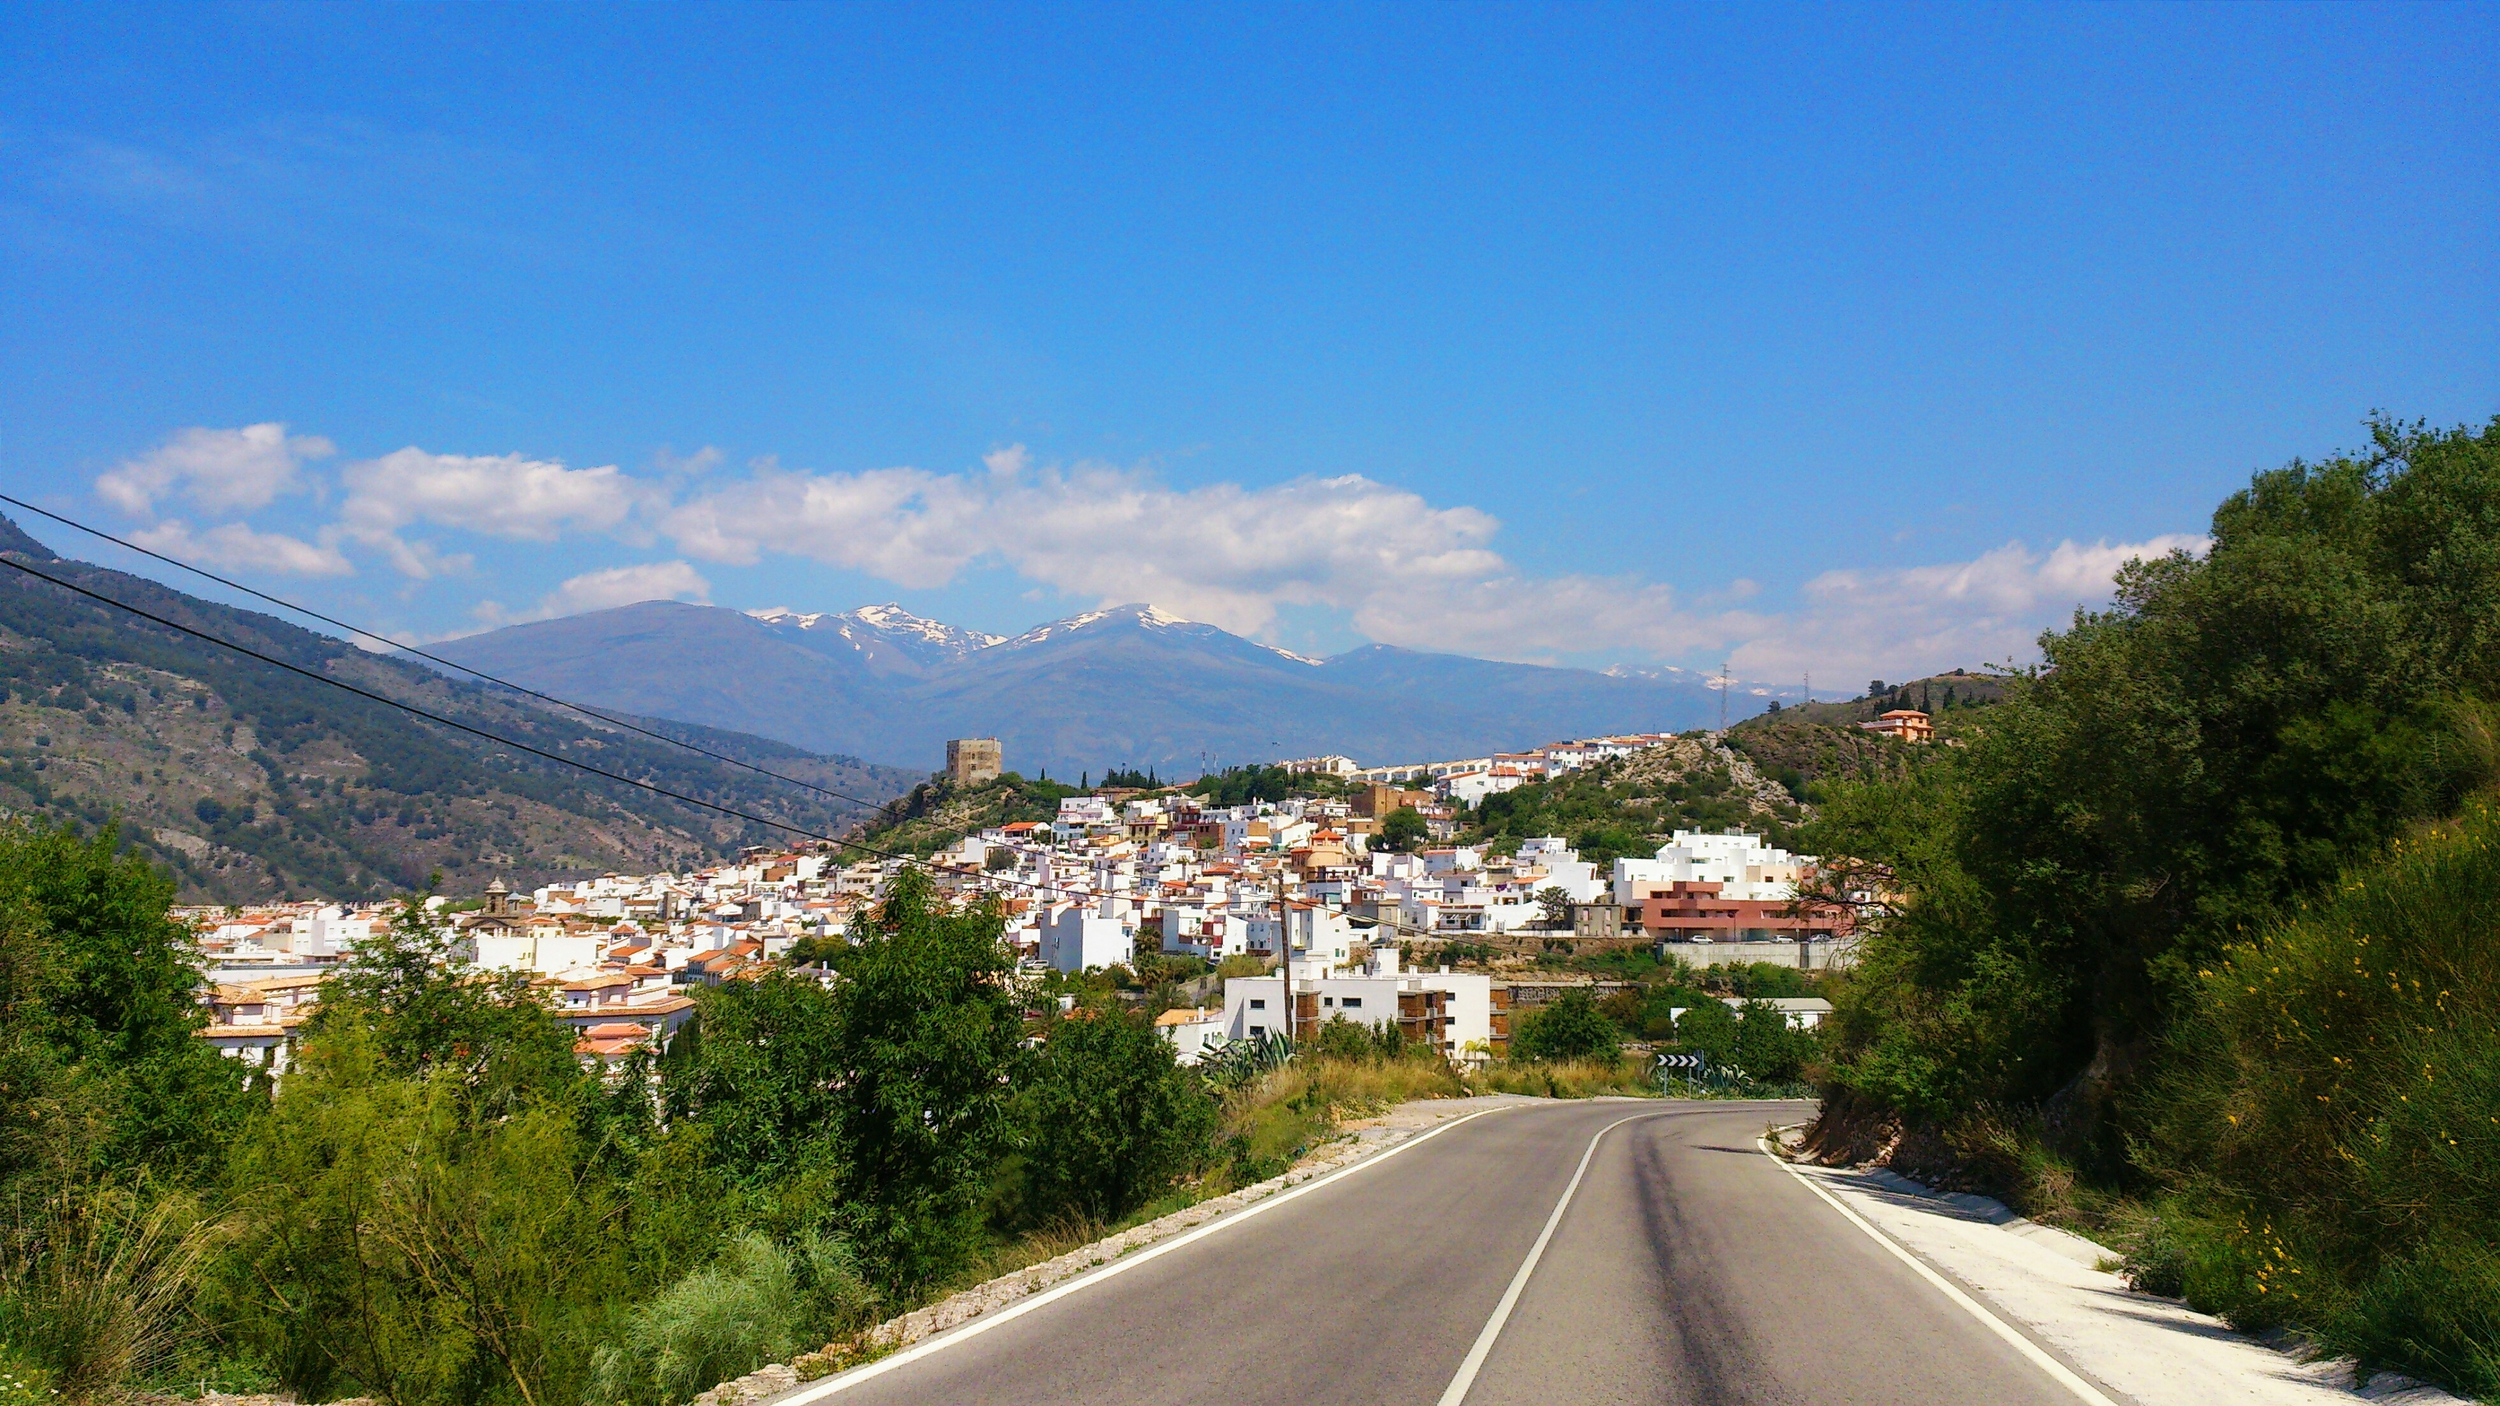 Velez de Benaudalla with the Sierra Nevada in the background.